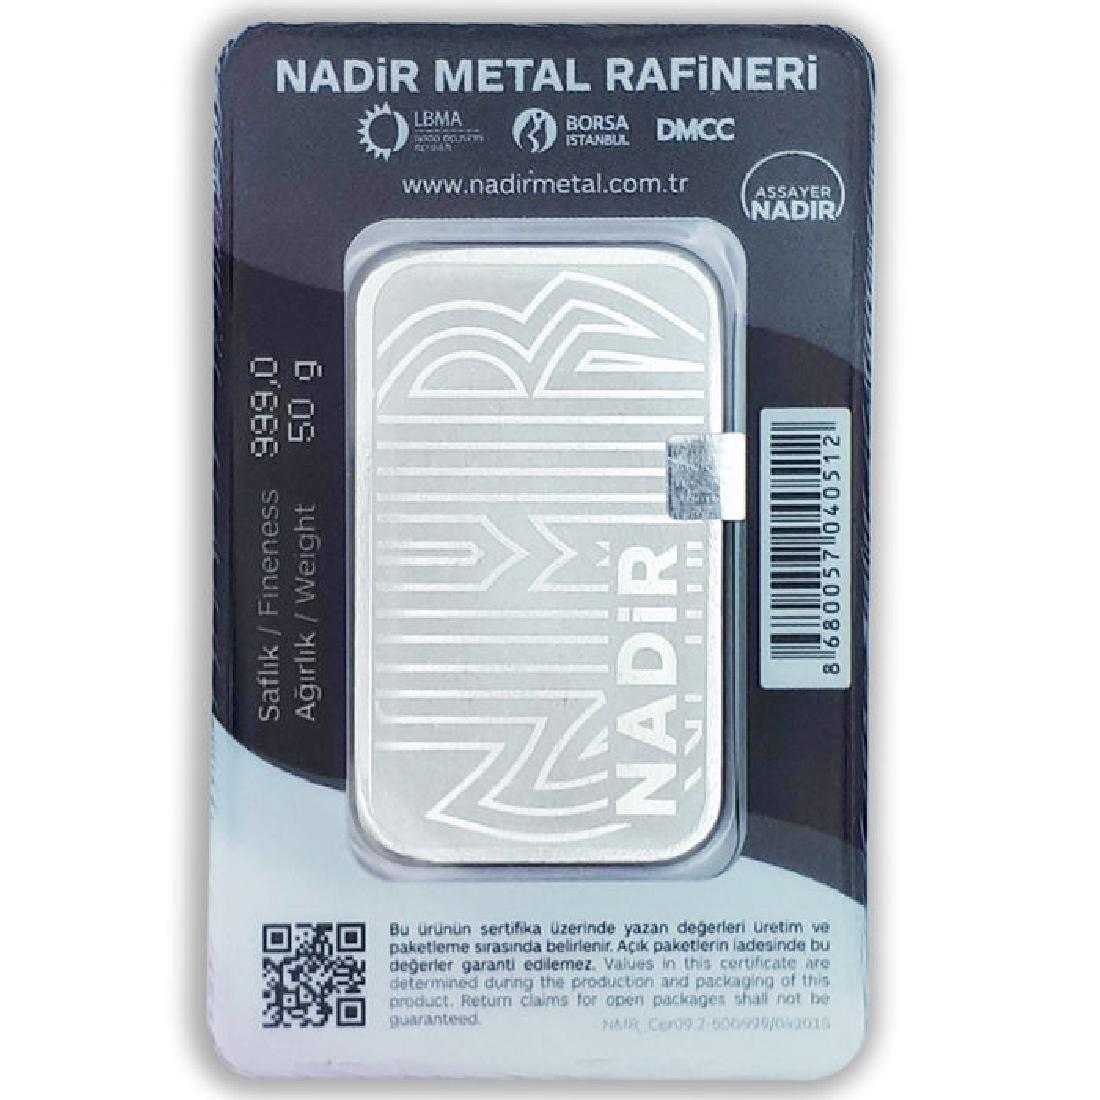 50 gr. - 999/1000 - Minted/ Sealed Silver bar - 4